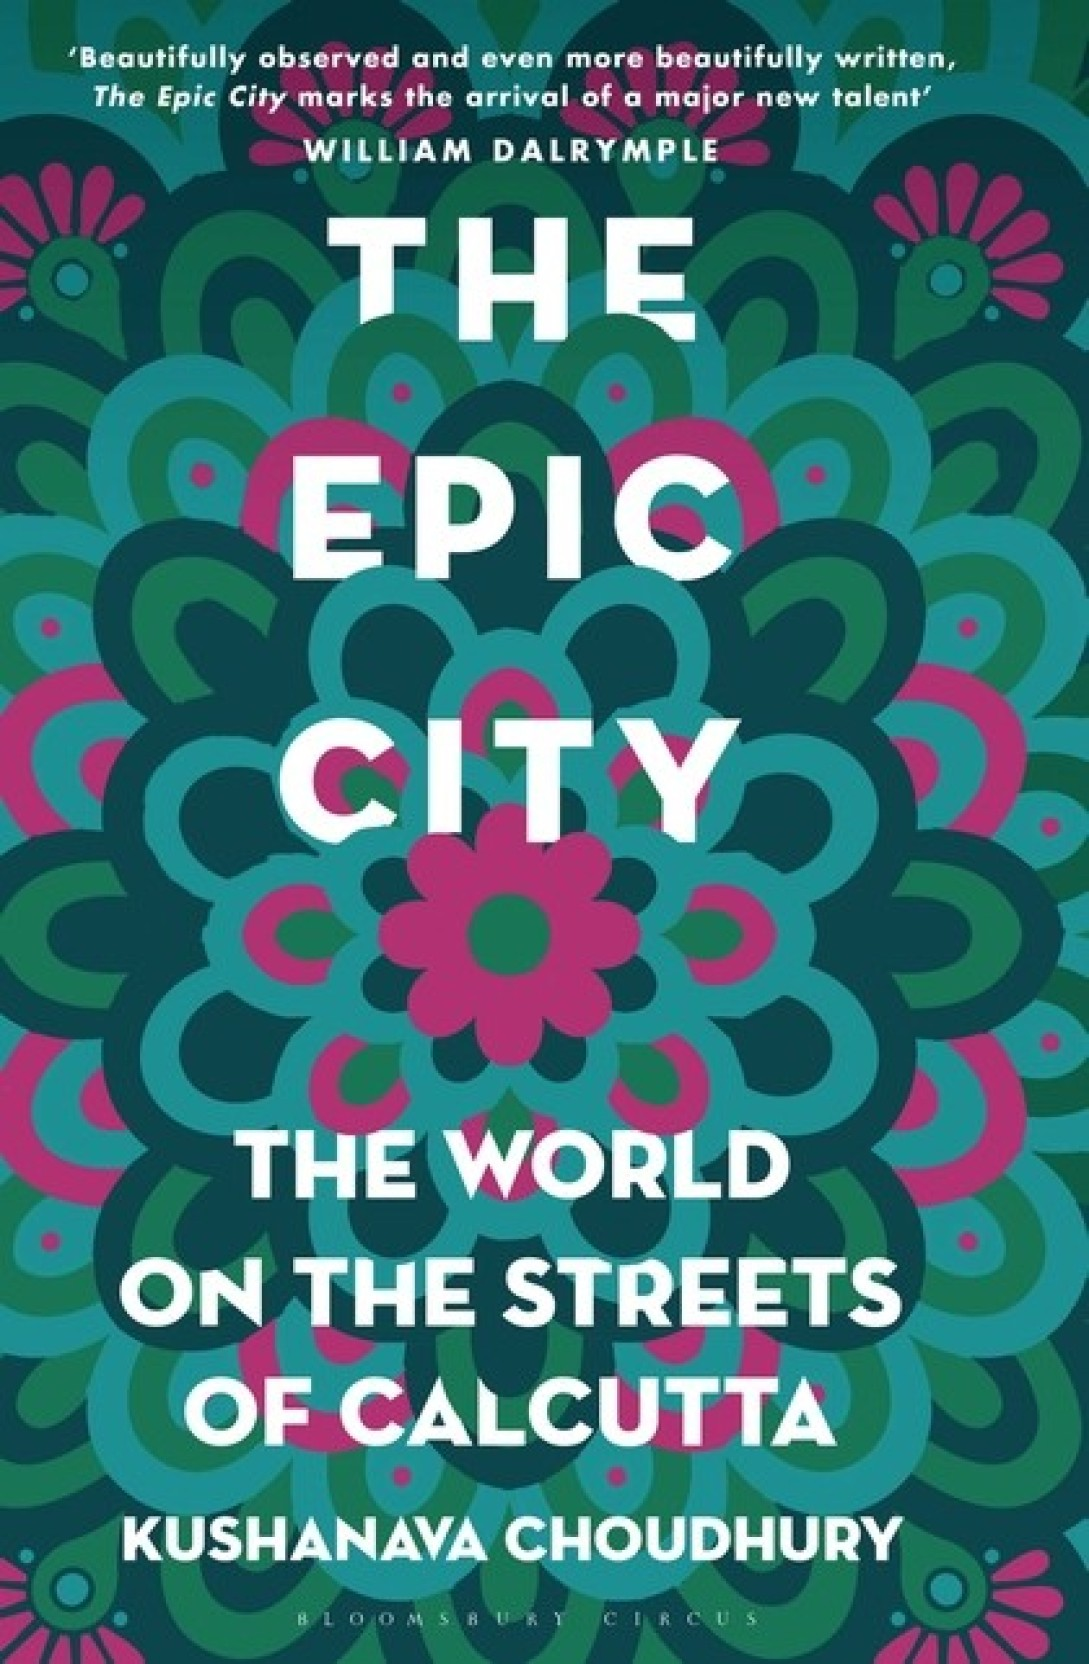 the-epic-city-original-imaexbjkqe5fp8y8.jpeg